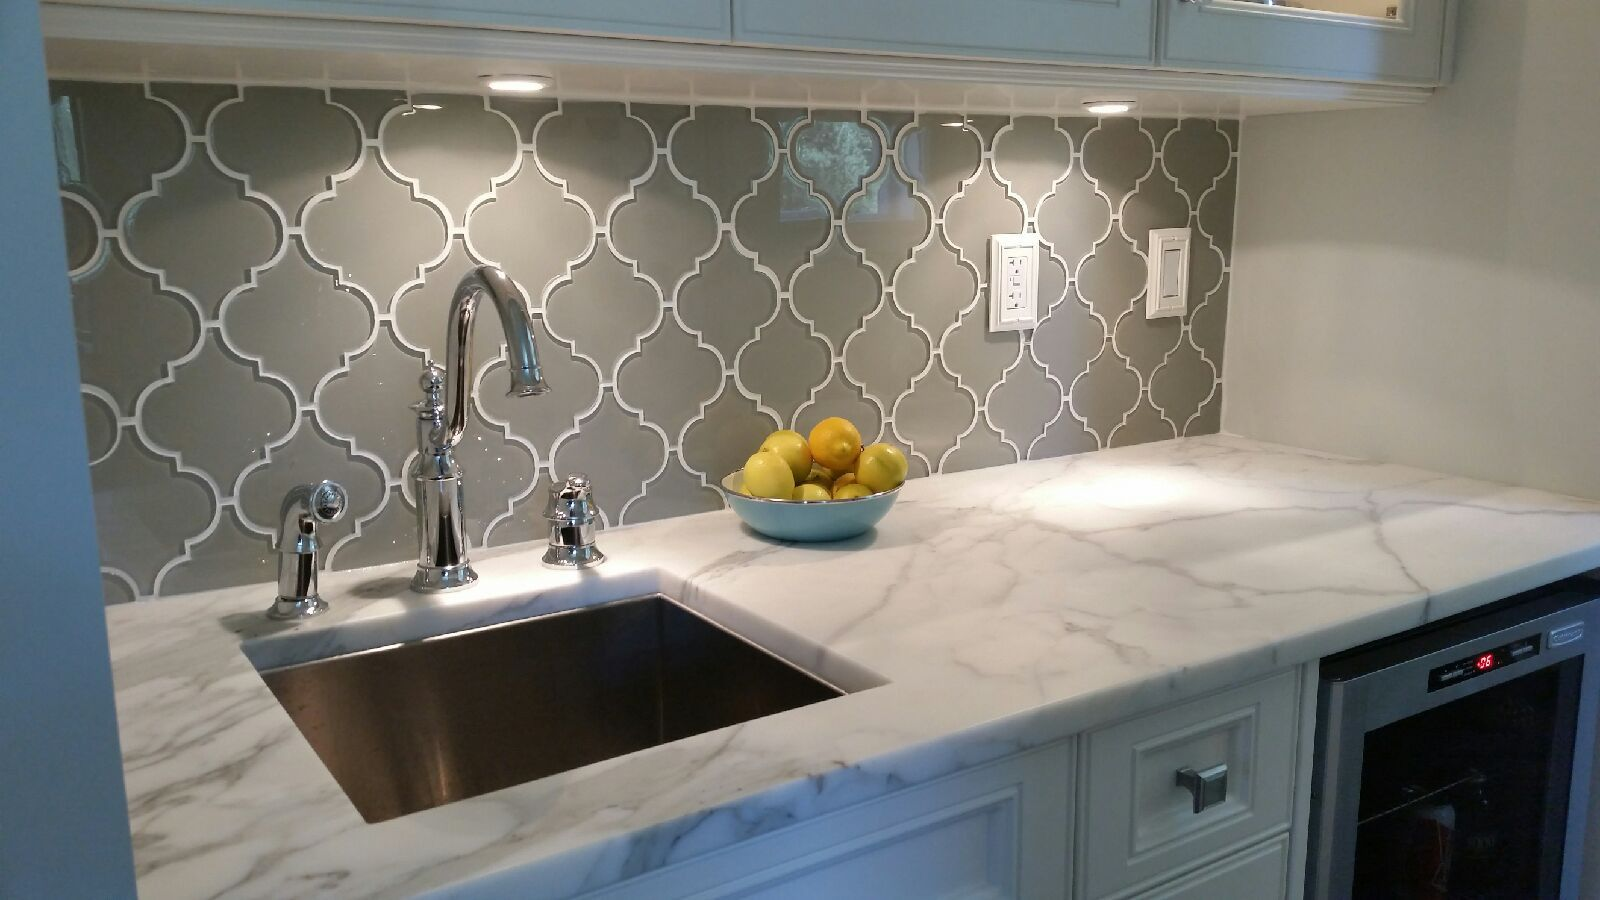 Glass Tile Kitchen Backsplash Large Sink Taupe Arabesque Mosaic Tiles Pinterest